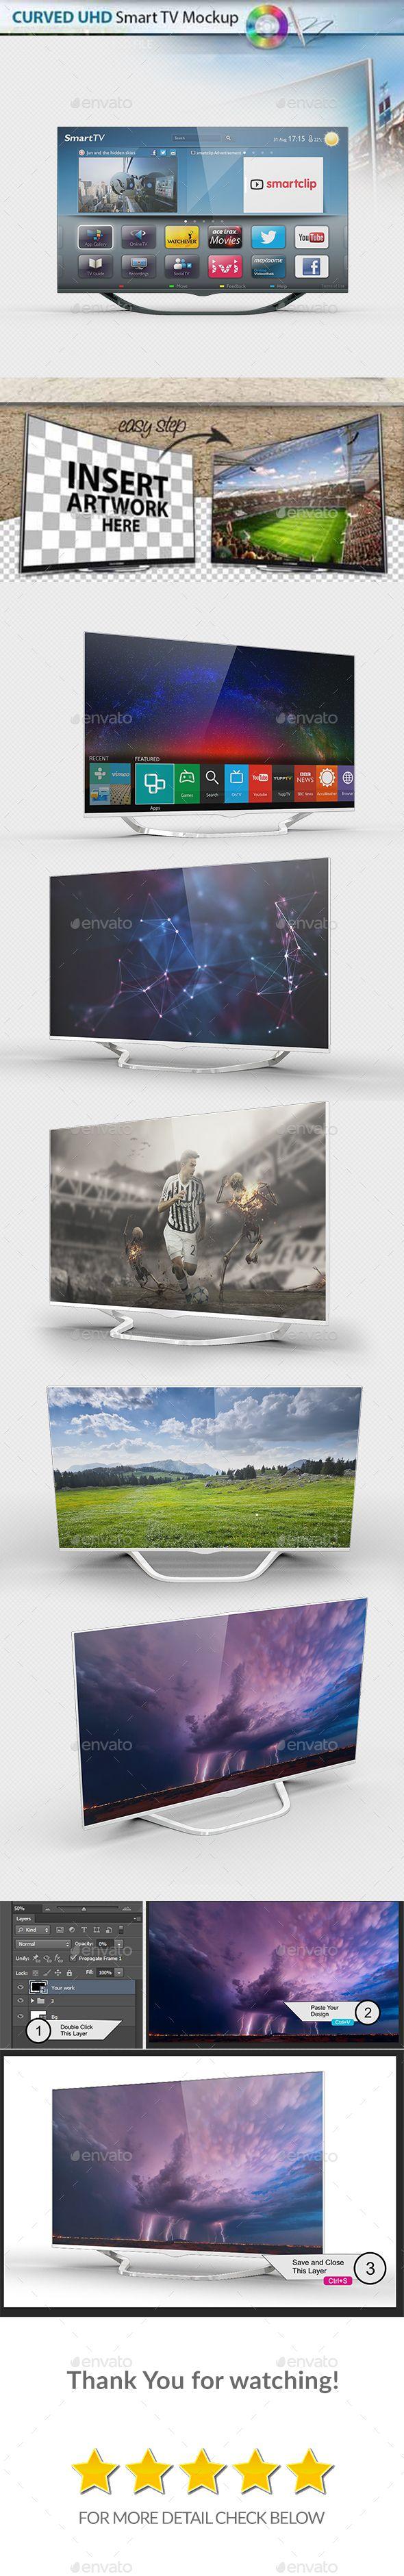 6 Smart Screen Mockup - UHD TV